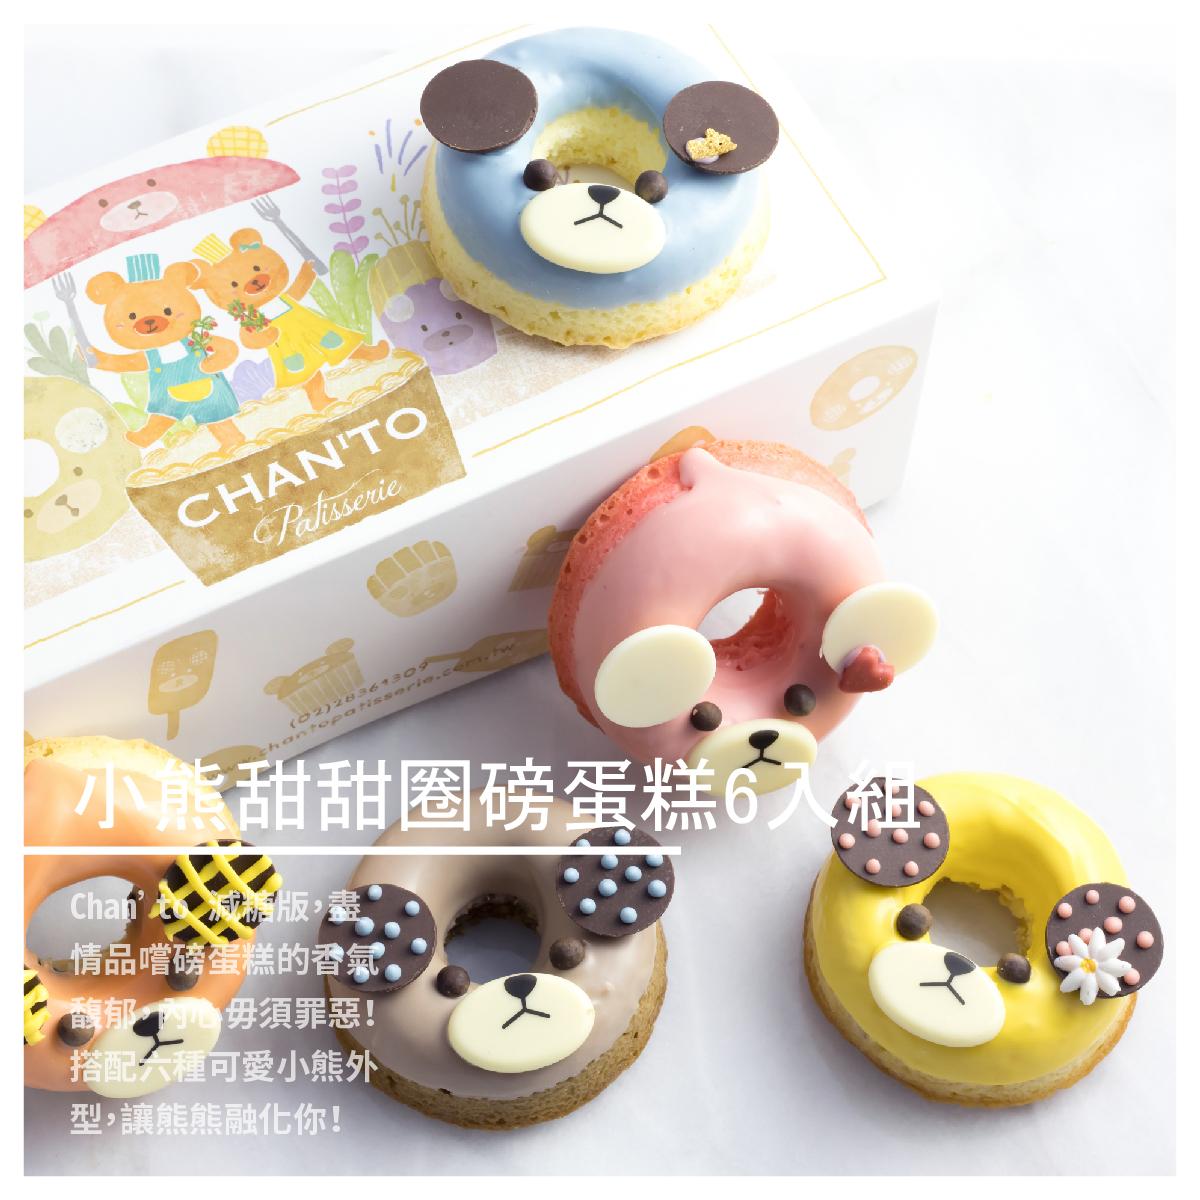 【CHAN'TO Patisserie】小熊甜甜圈磅蛋糕6入組